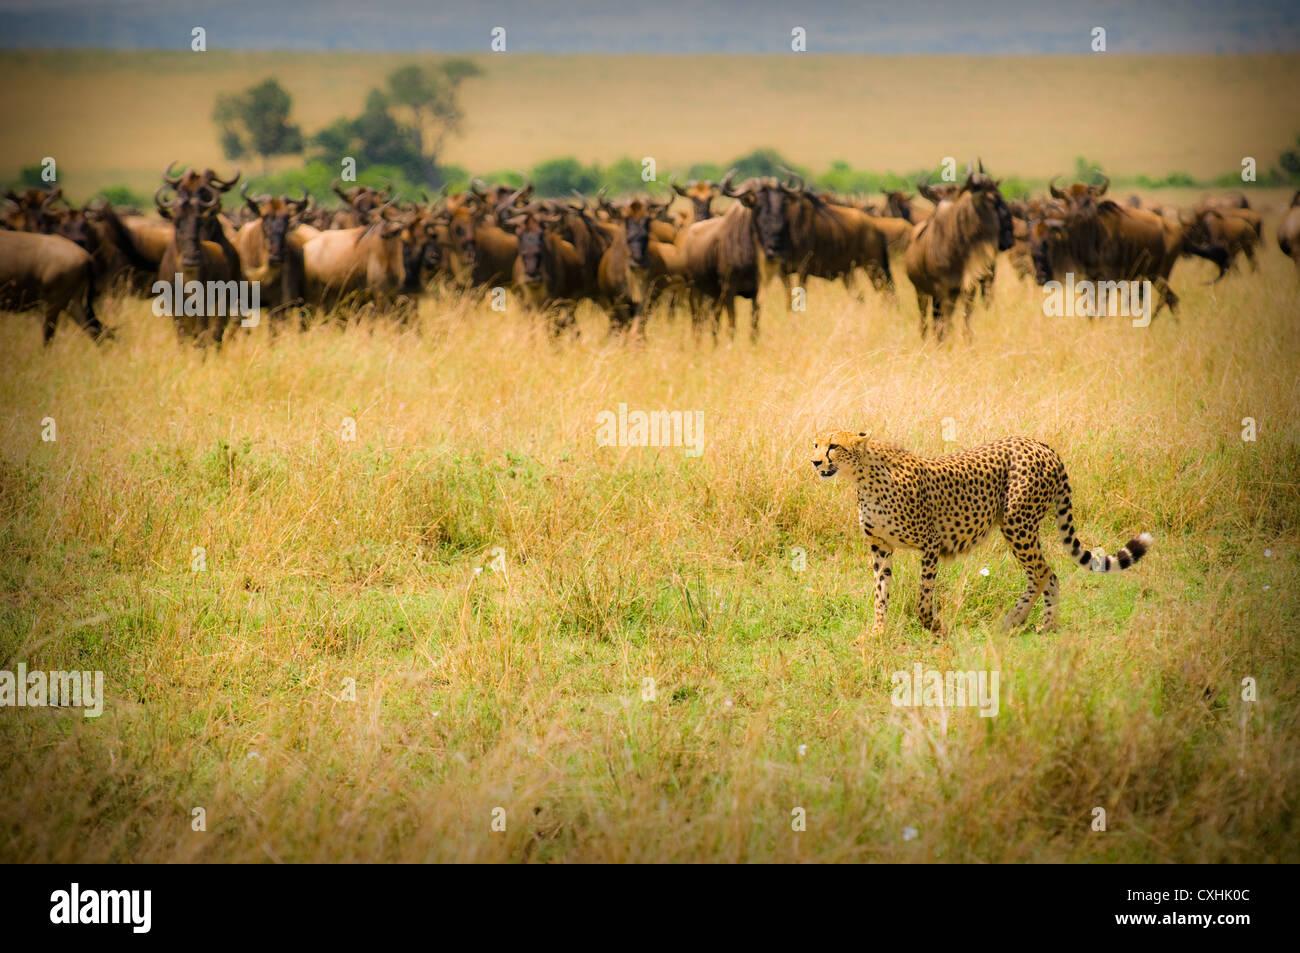 chasse du guépard Photo Stock